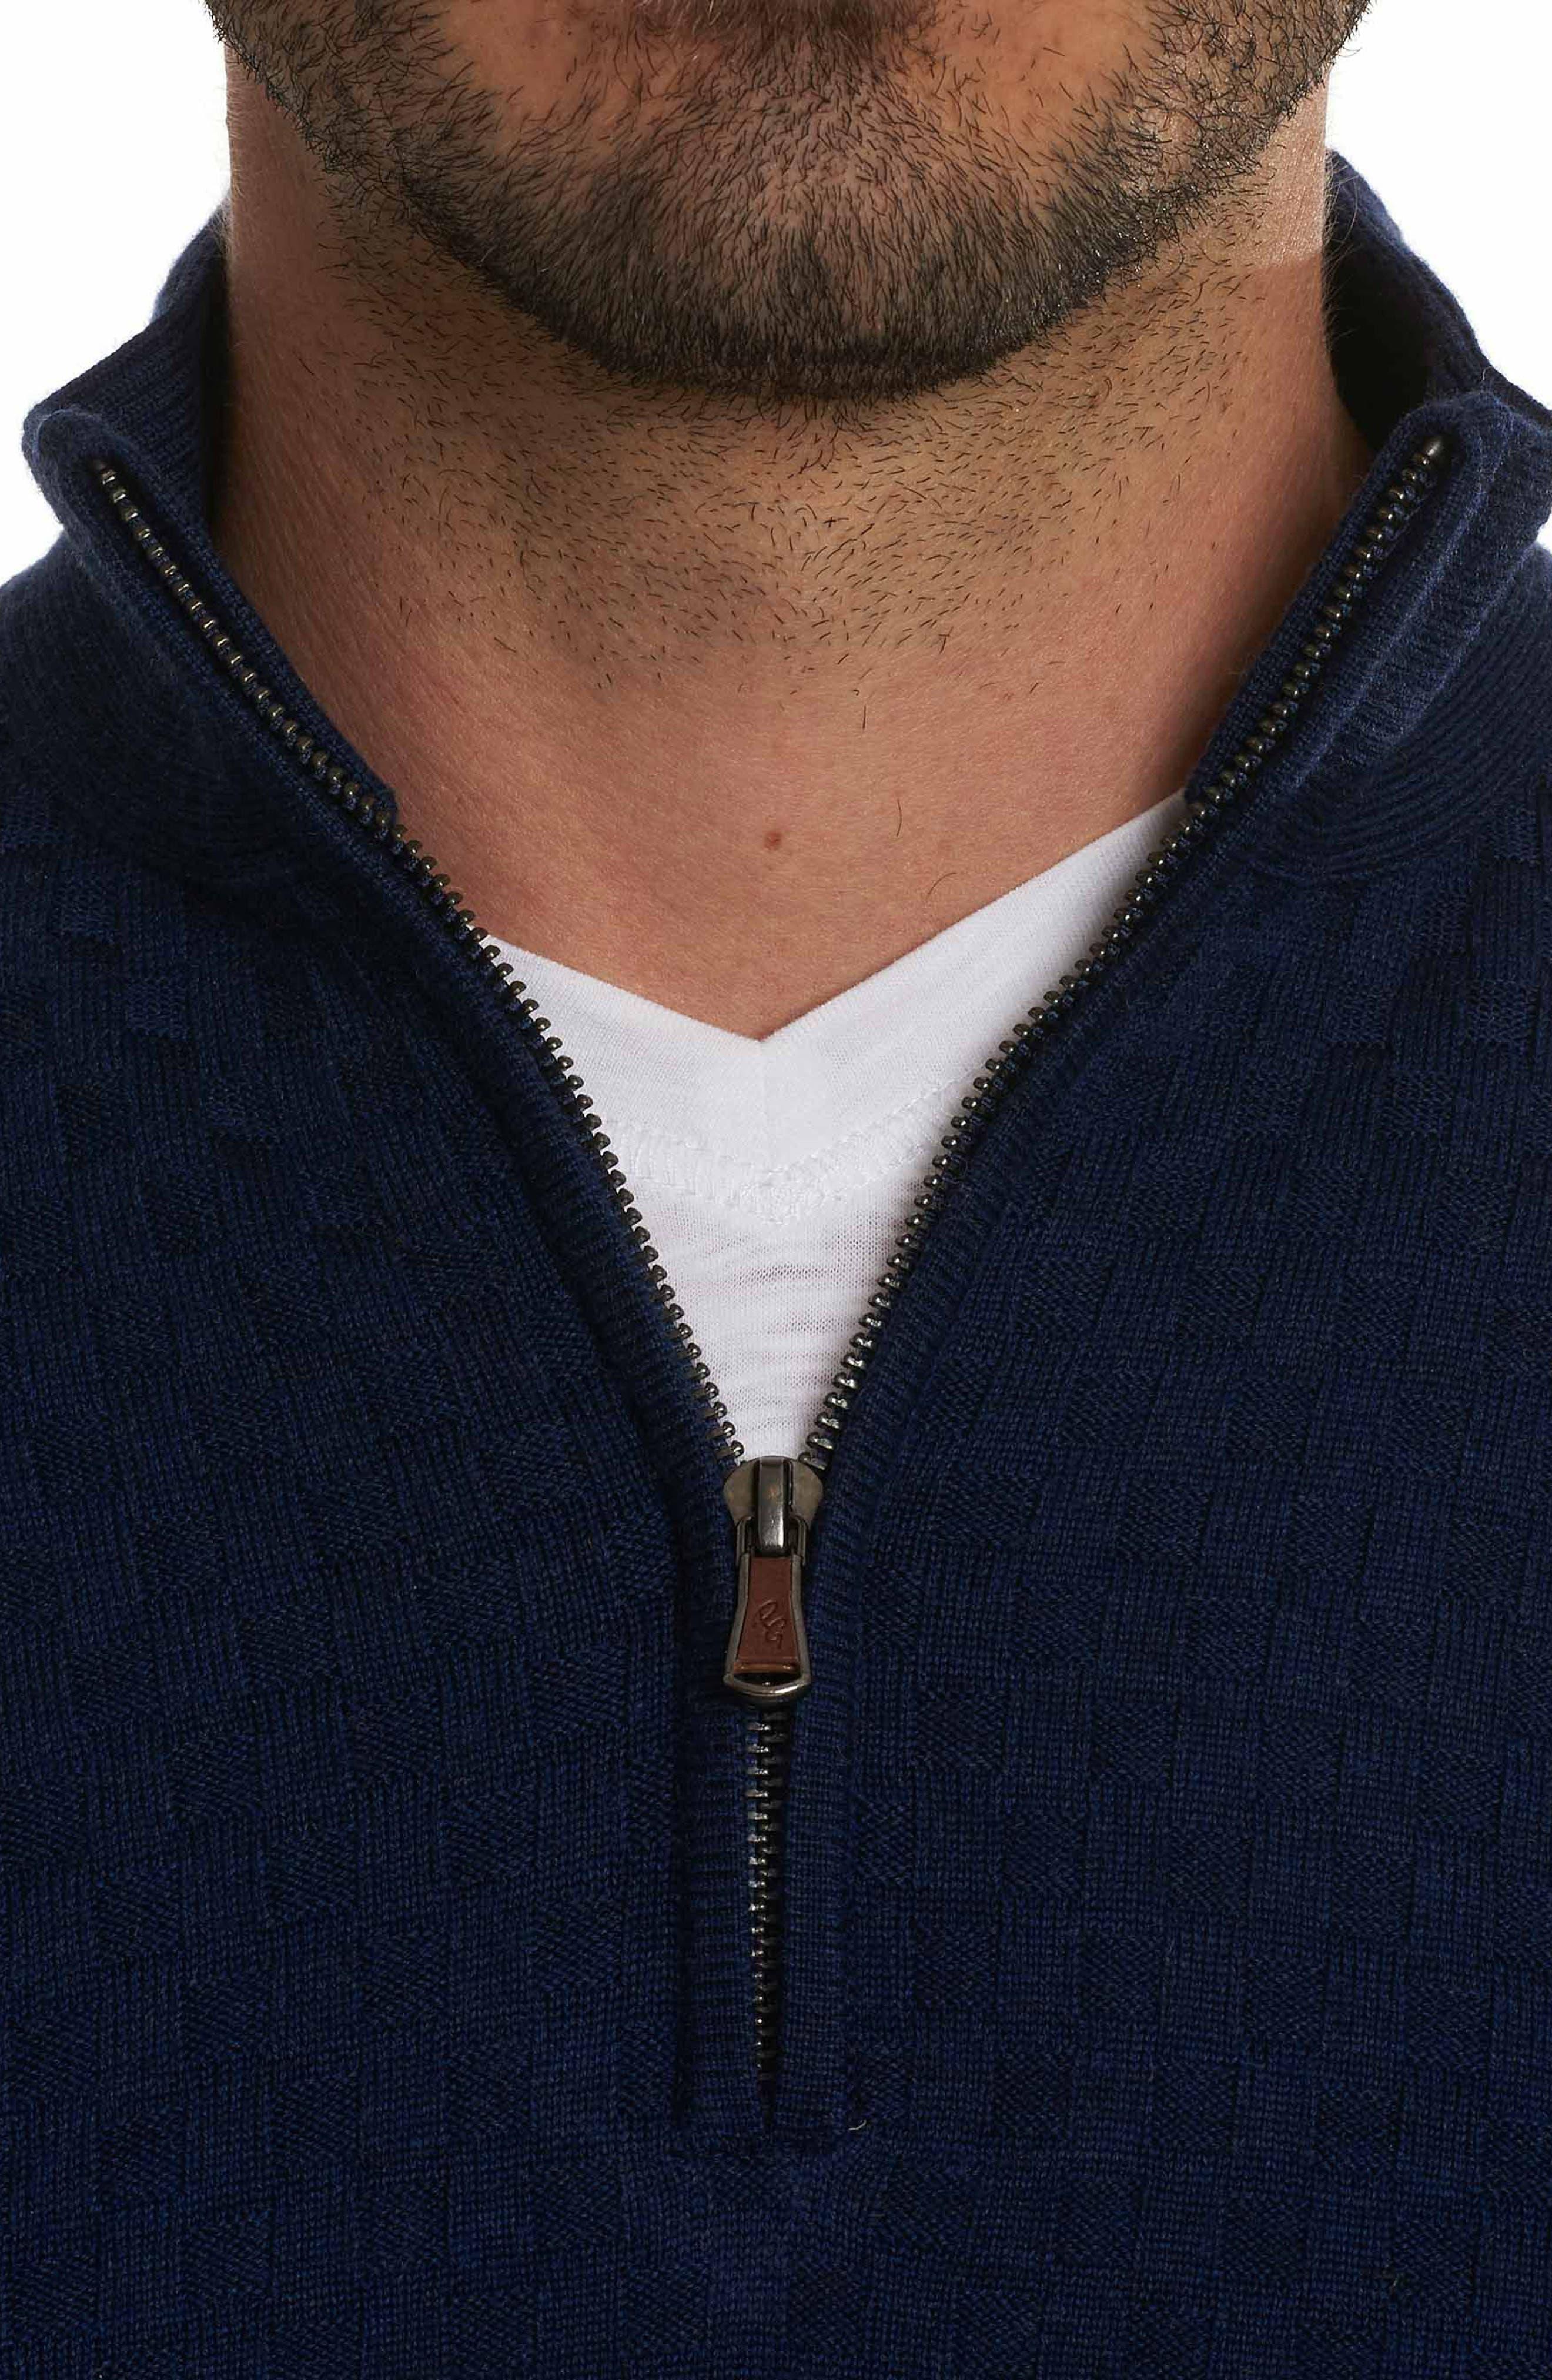 American Beech Wool Sweater,                             Alternate thumbnail 4, color,                             Navy